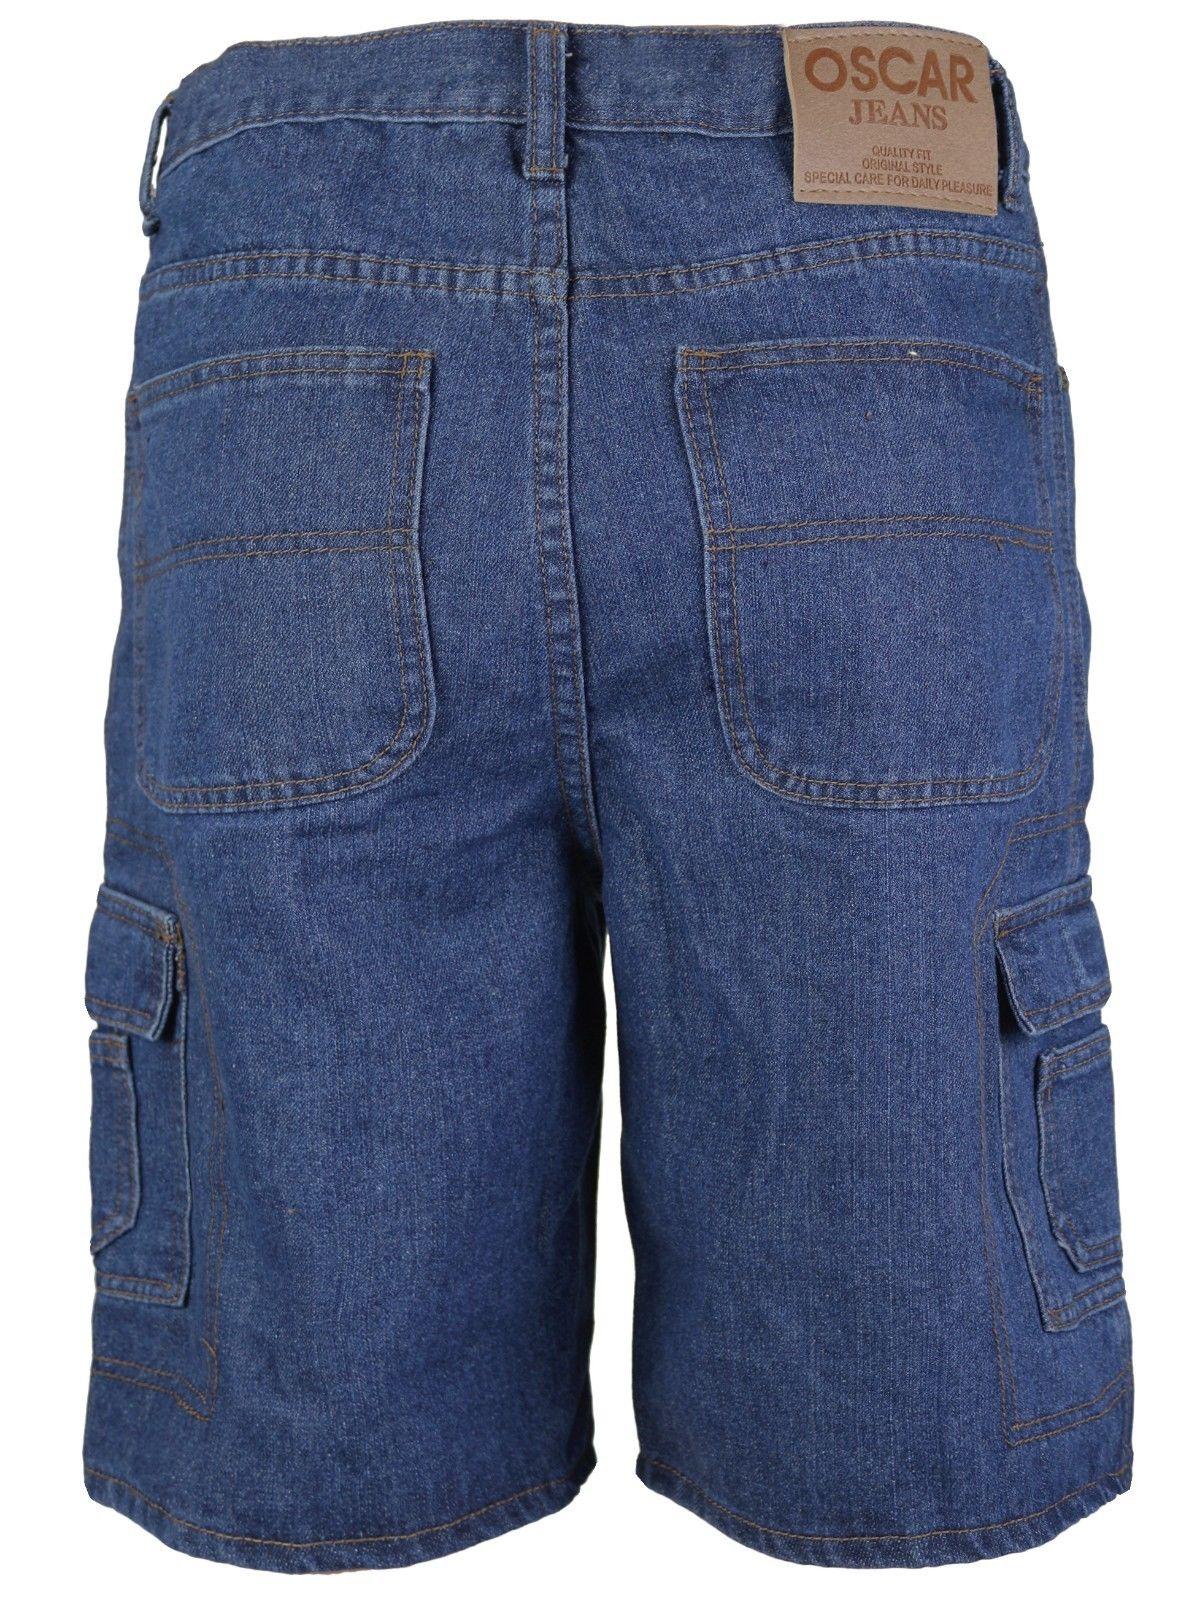 Men-039-s-Premium-Cotton-Multi-Pocket-Relaxed-Fit-Stonewash-Denim-Jean-Cargo-Shorts thumbnail 18